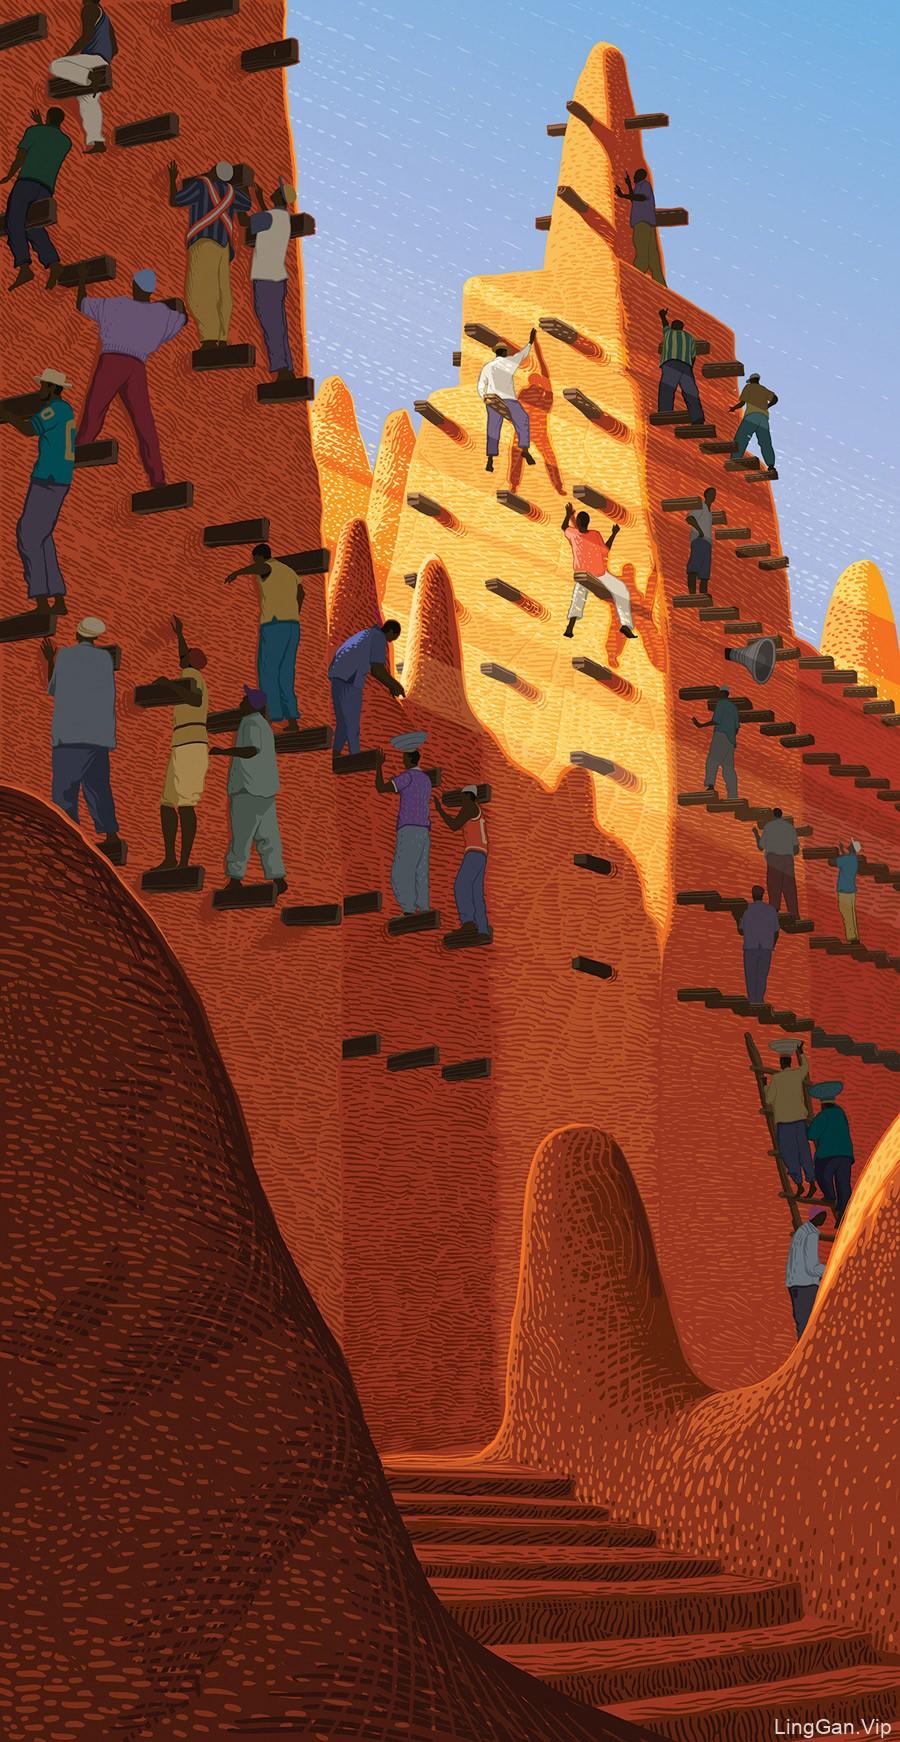 Sam Chivers设计的一系列插画海报